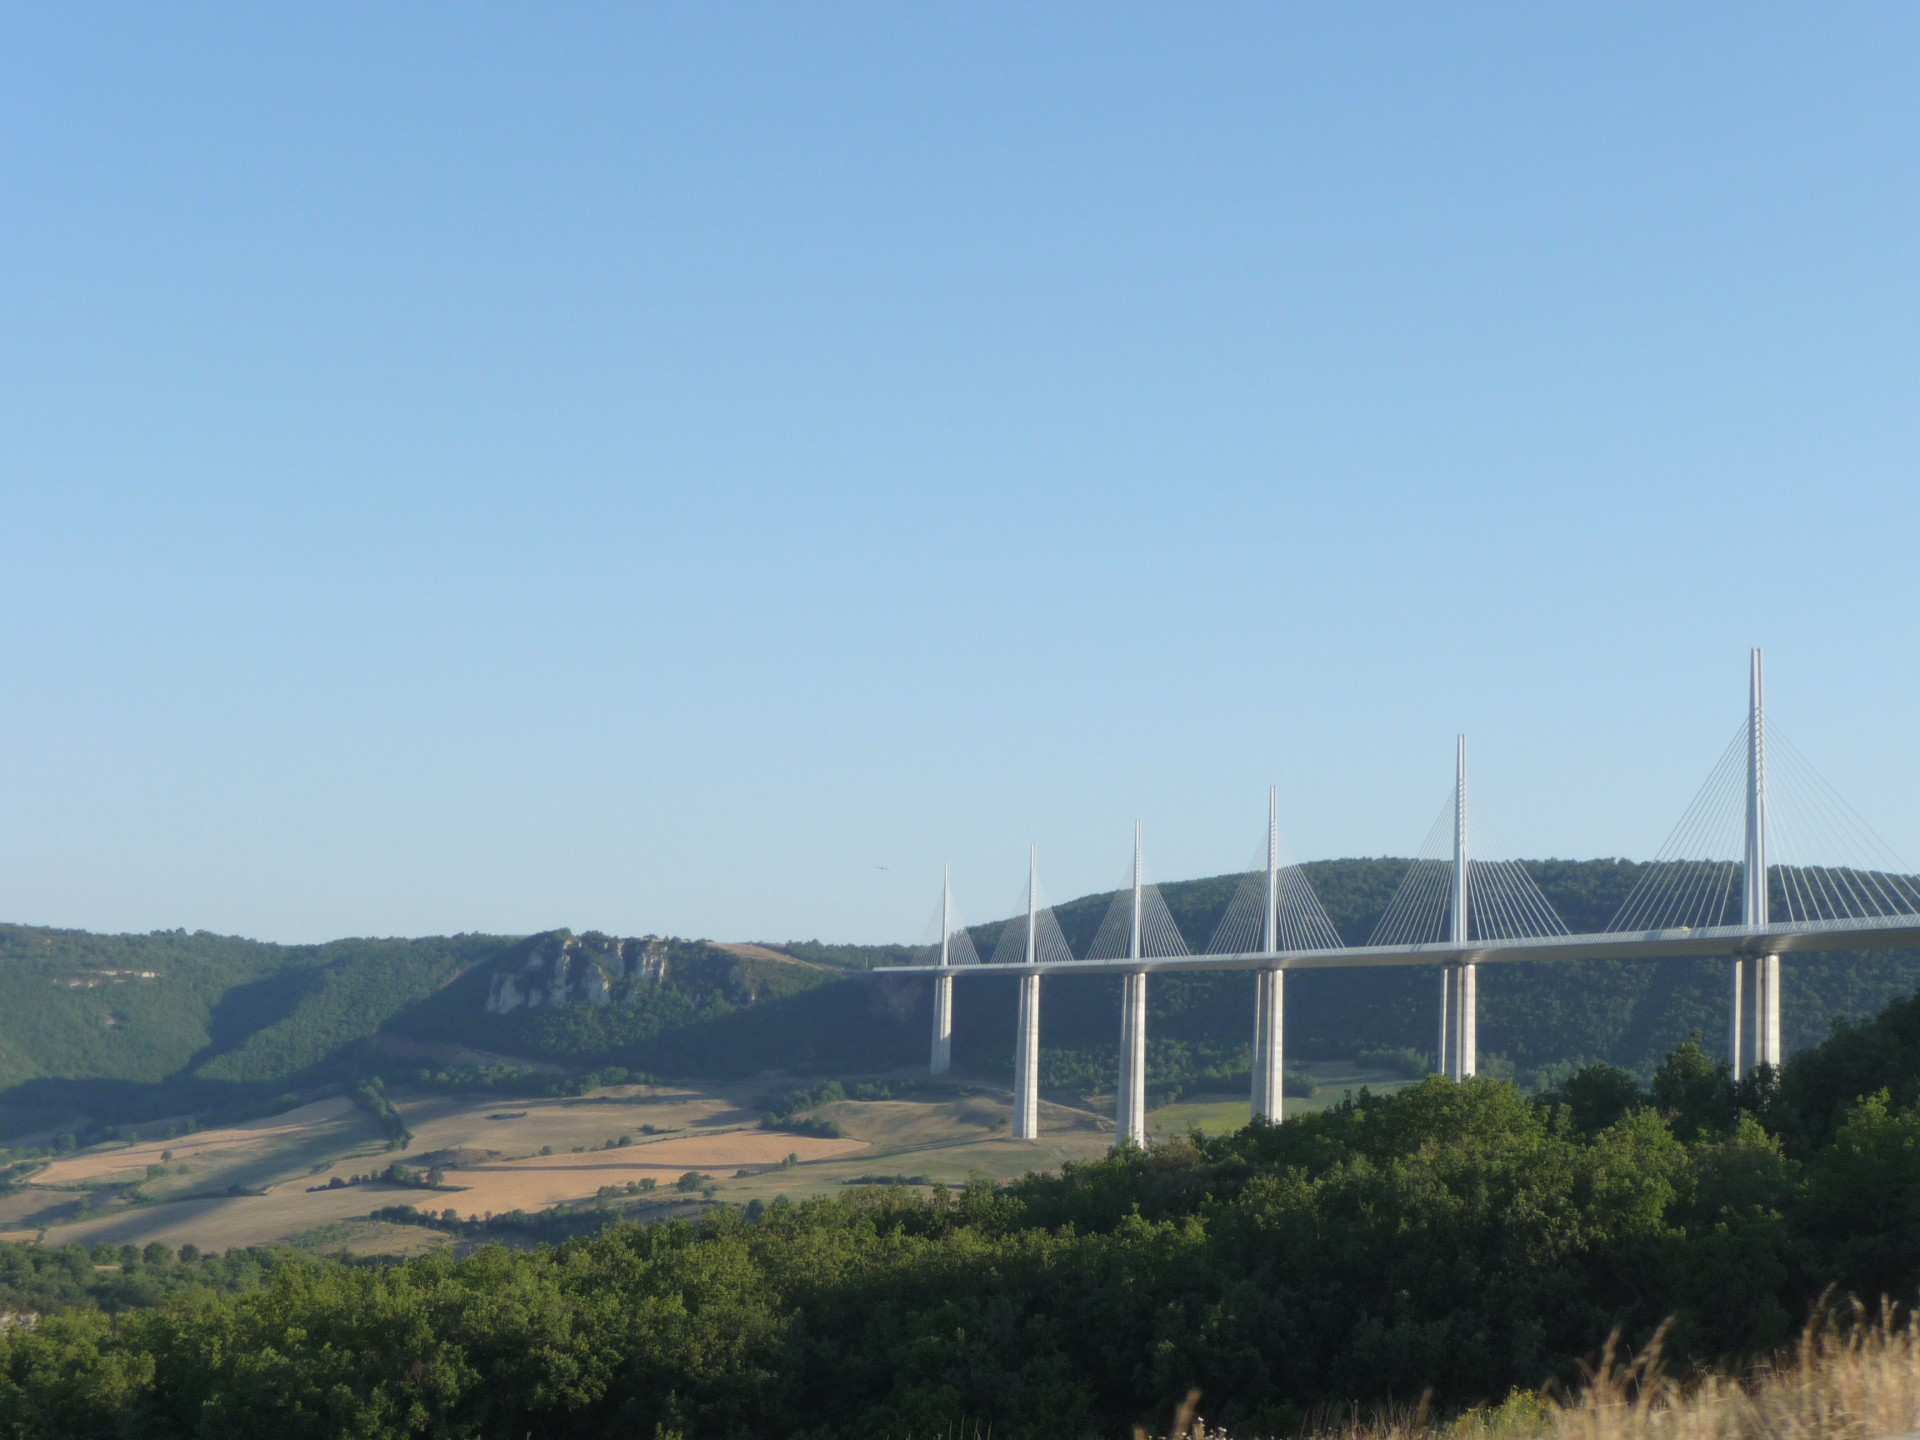 Viaduc de millau symbiose von moderner architektur und natur for Architektur und natur